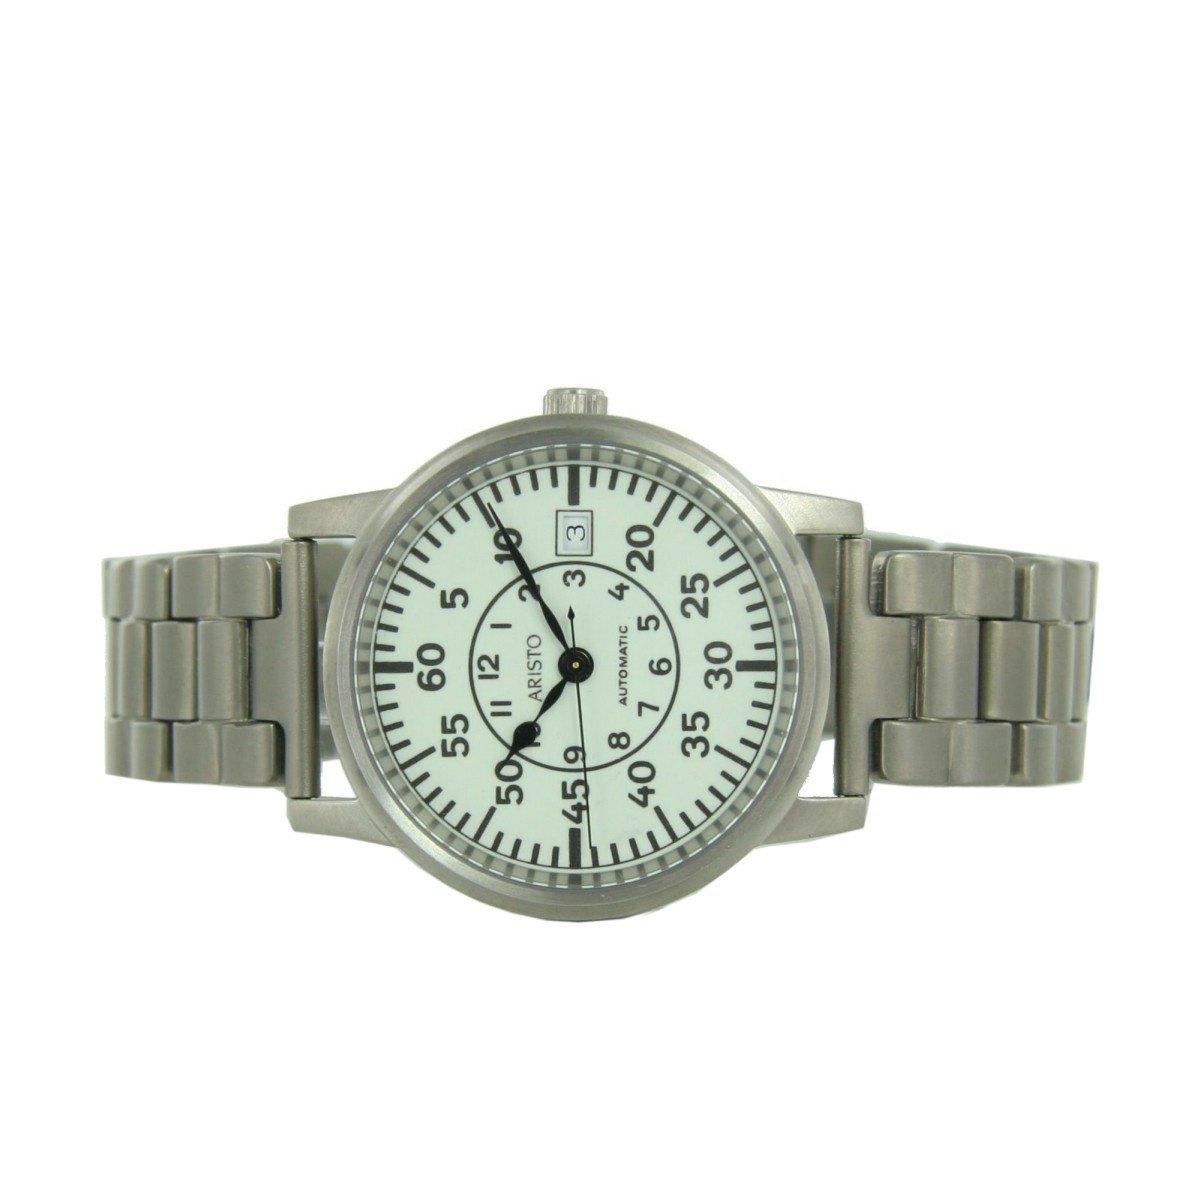 Aristo Men's Watch U-Boot Uhr Automatic Titan 5H92TIB by Aristo